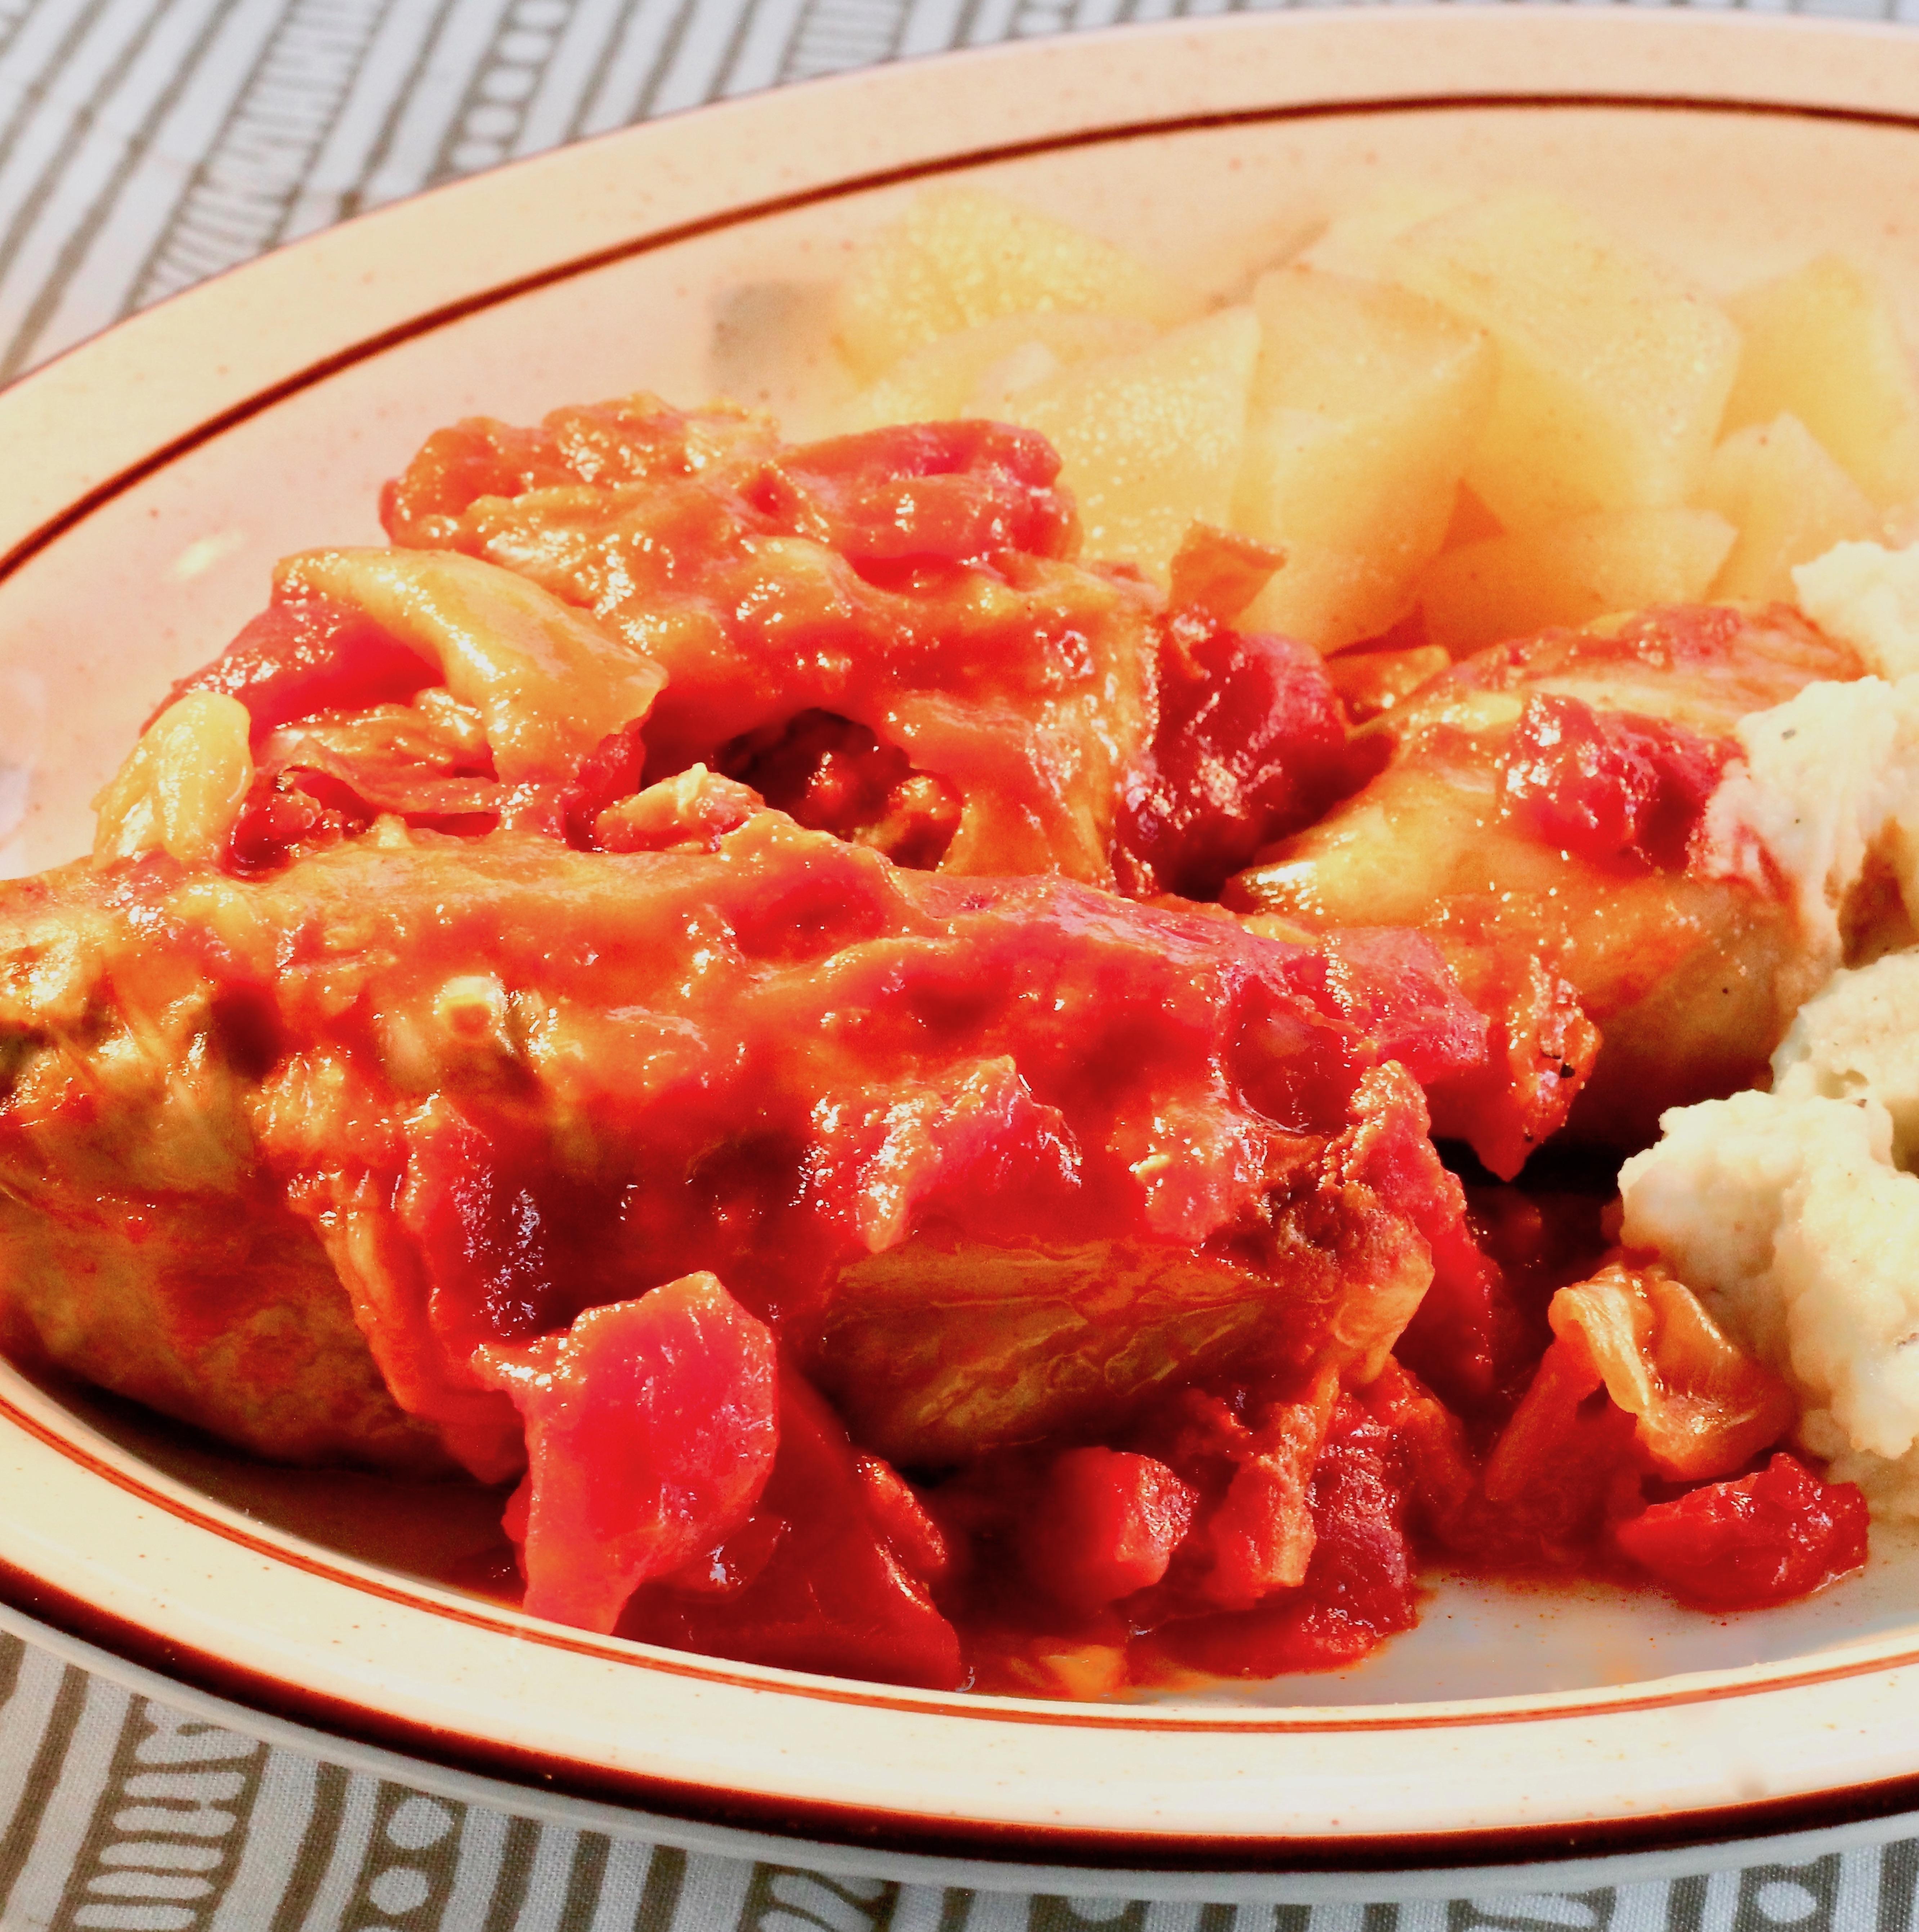 Halupki (Stuffed Cabbage) lutzflcat